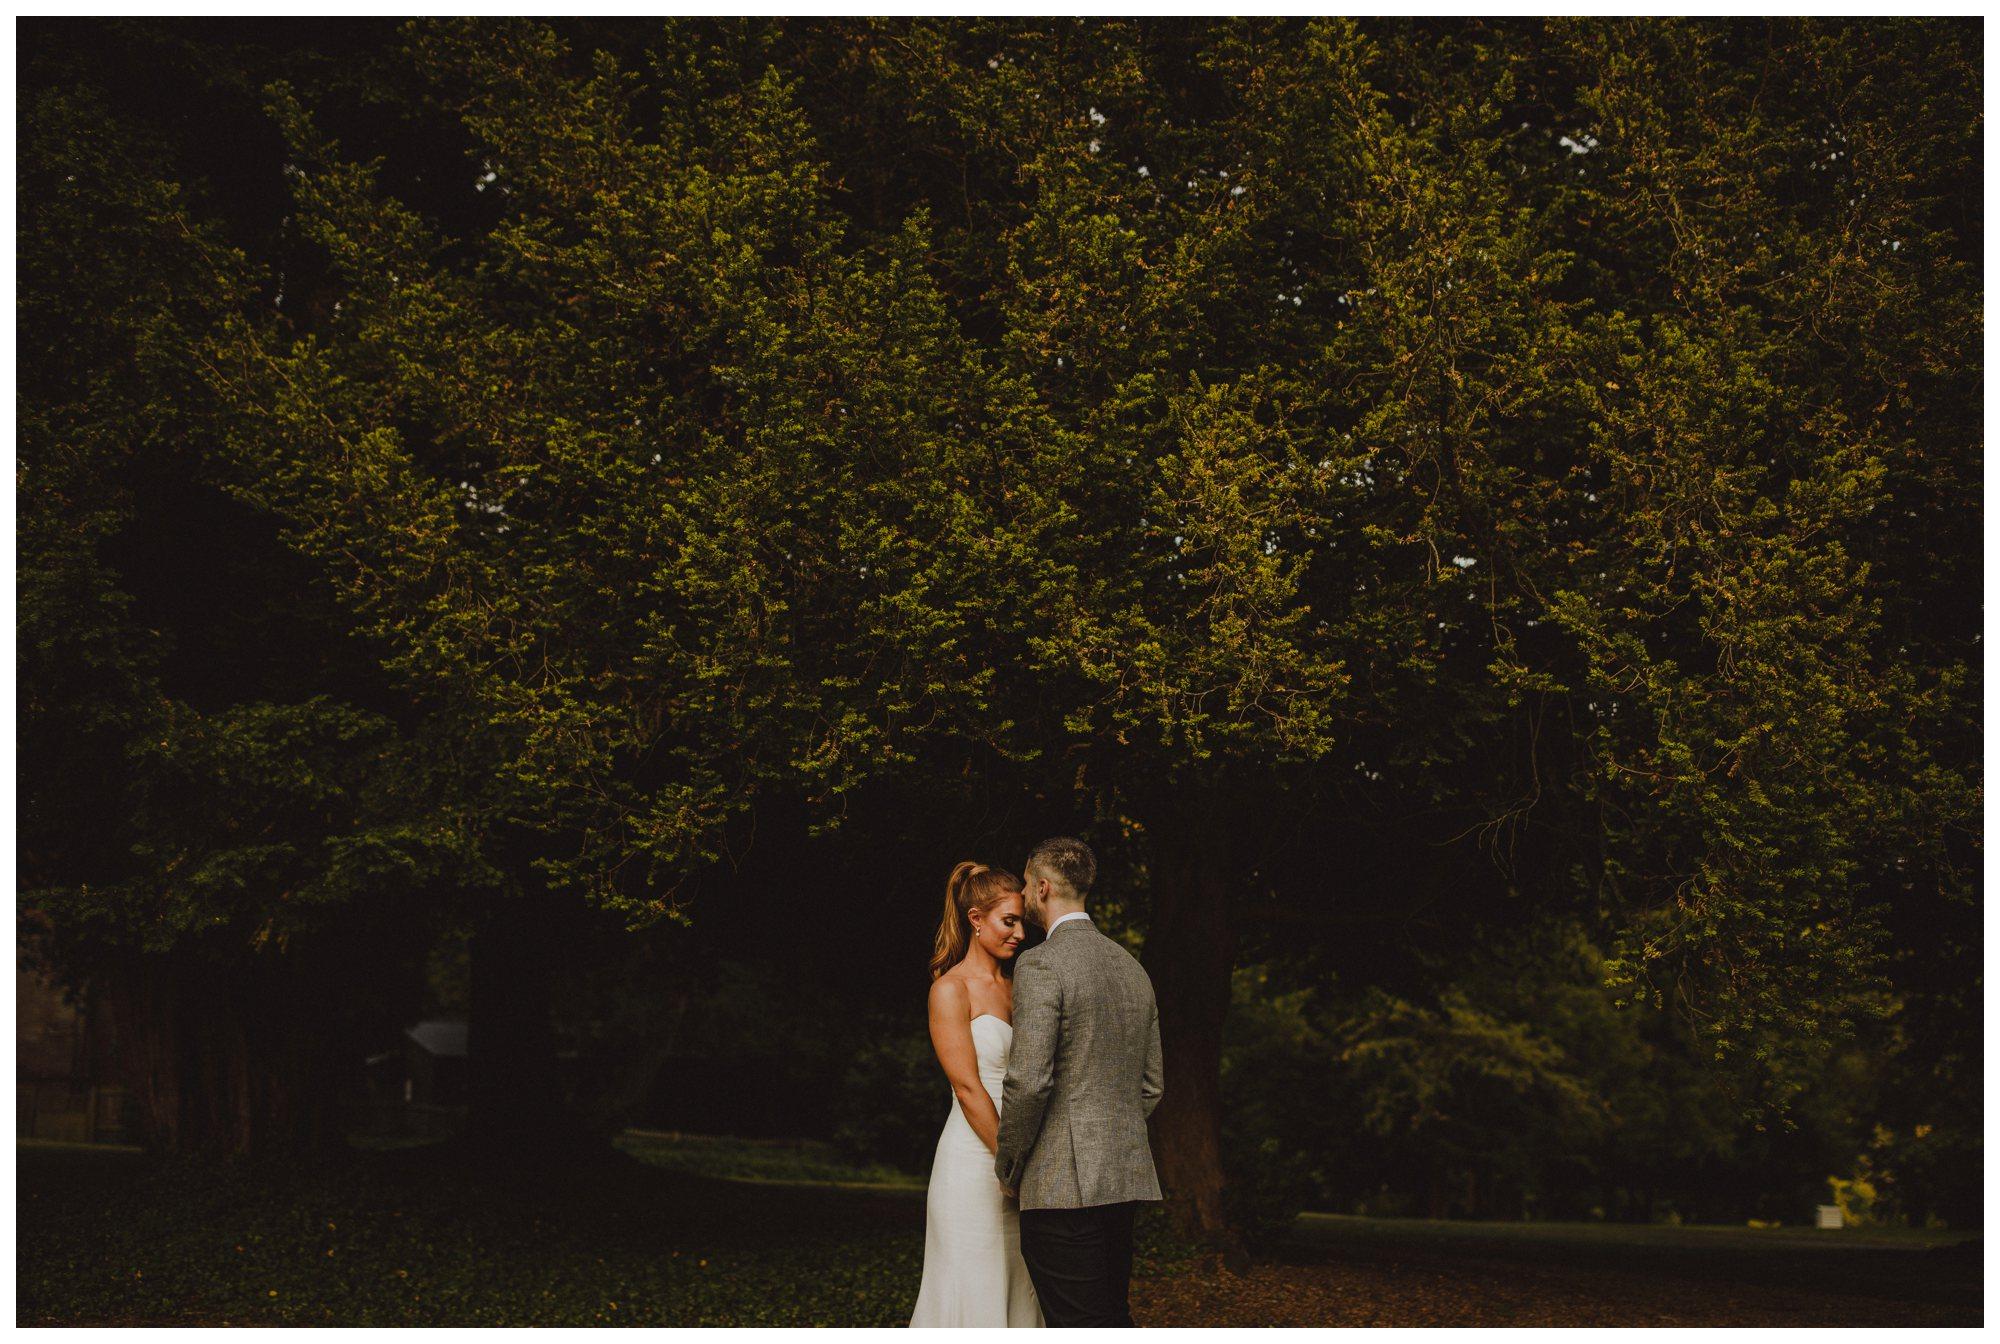 de-vere-latimer-estate-wedding-buckinghamshire_0099.jpg